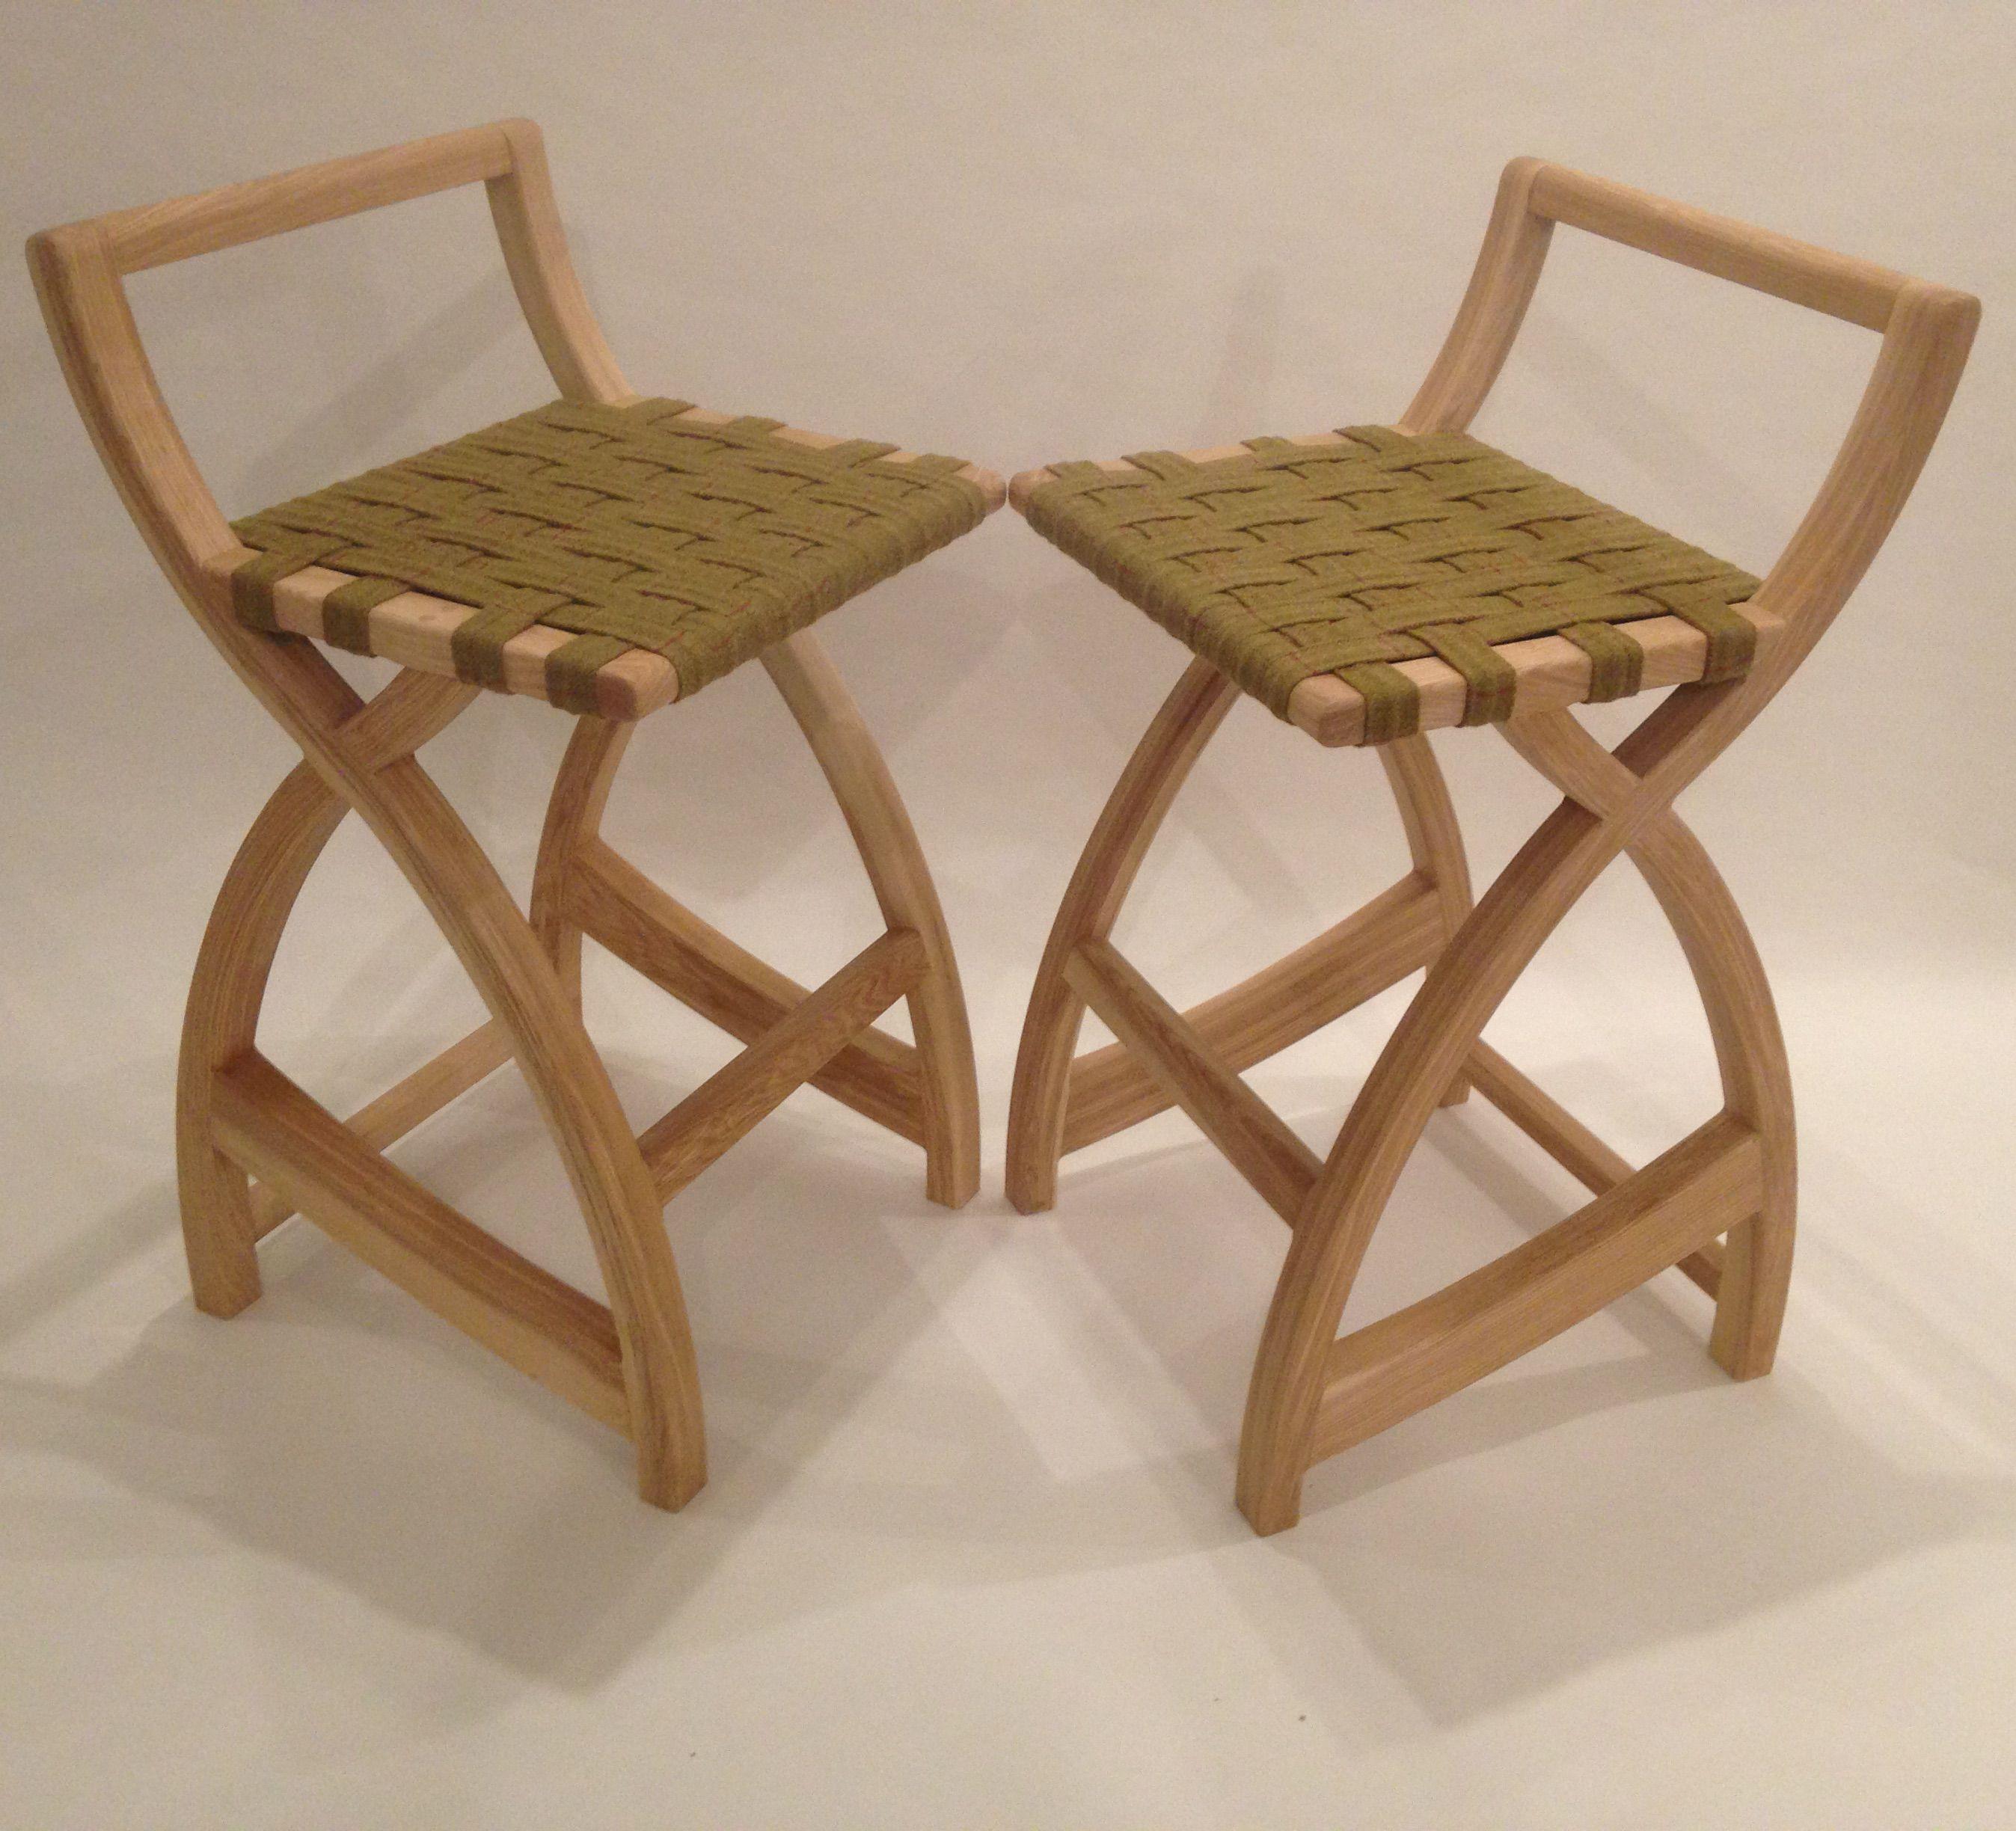 Pair of ash bar stools with woven tweed seats.